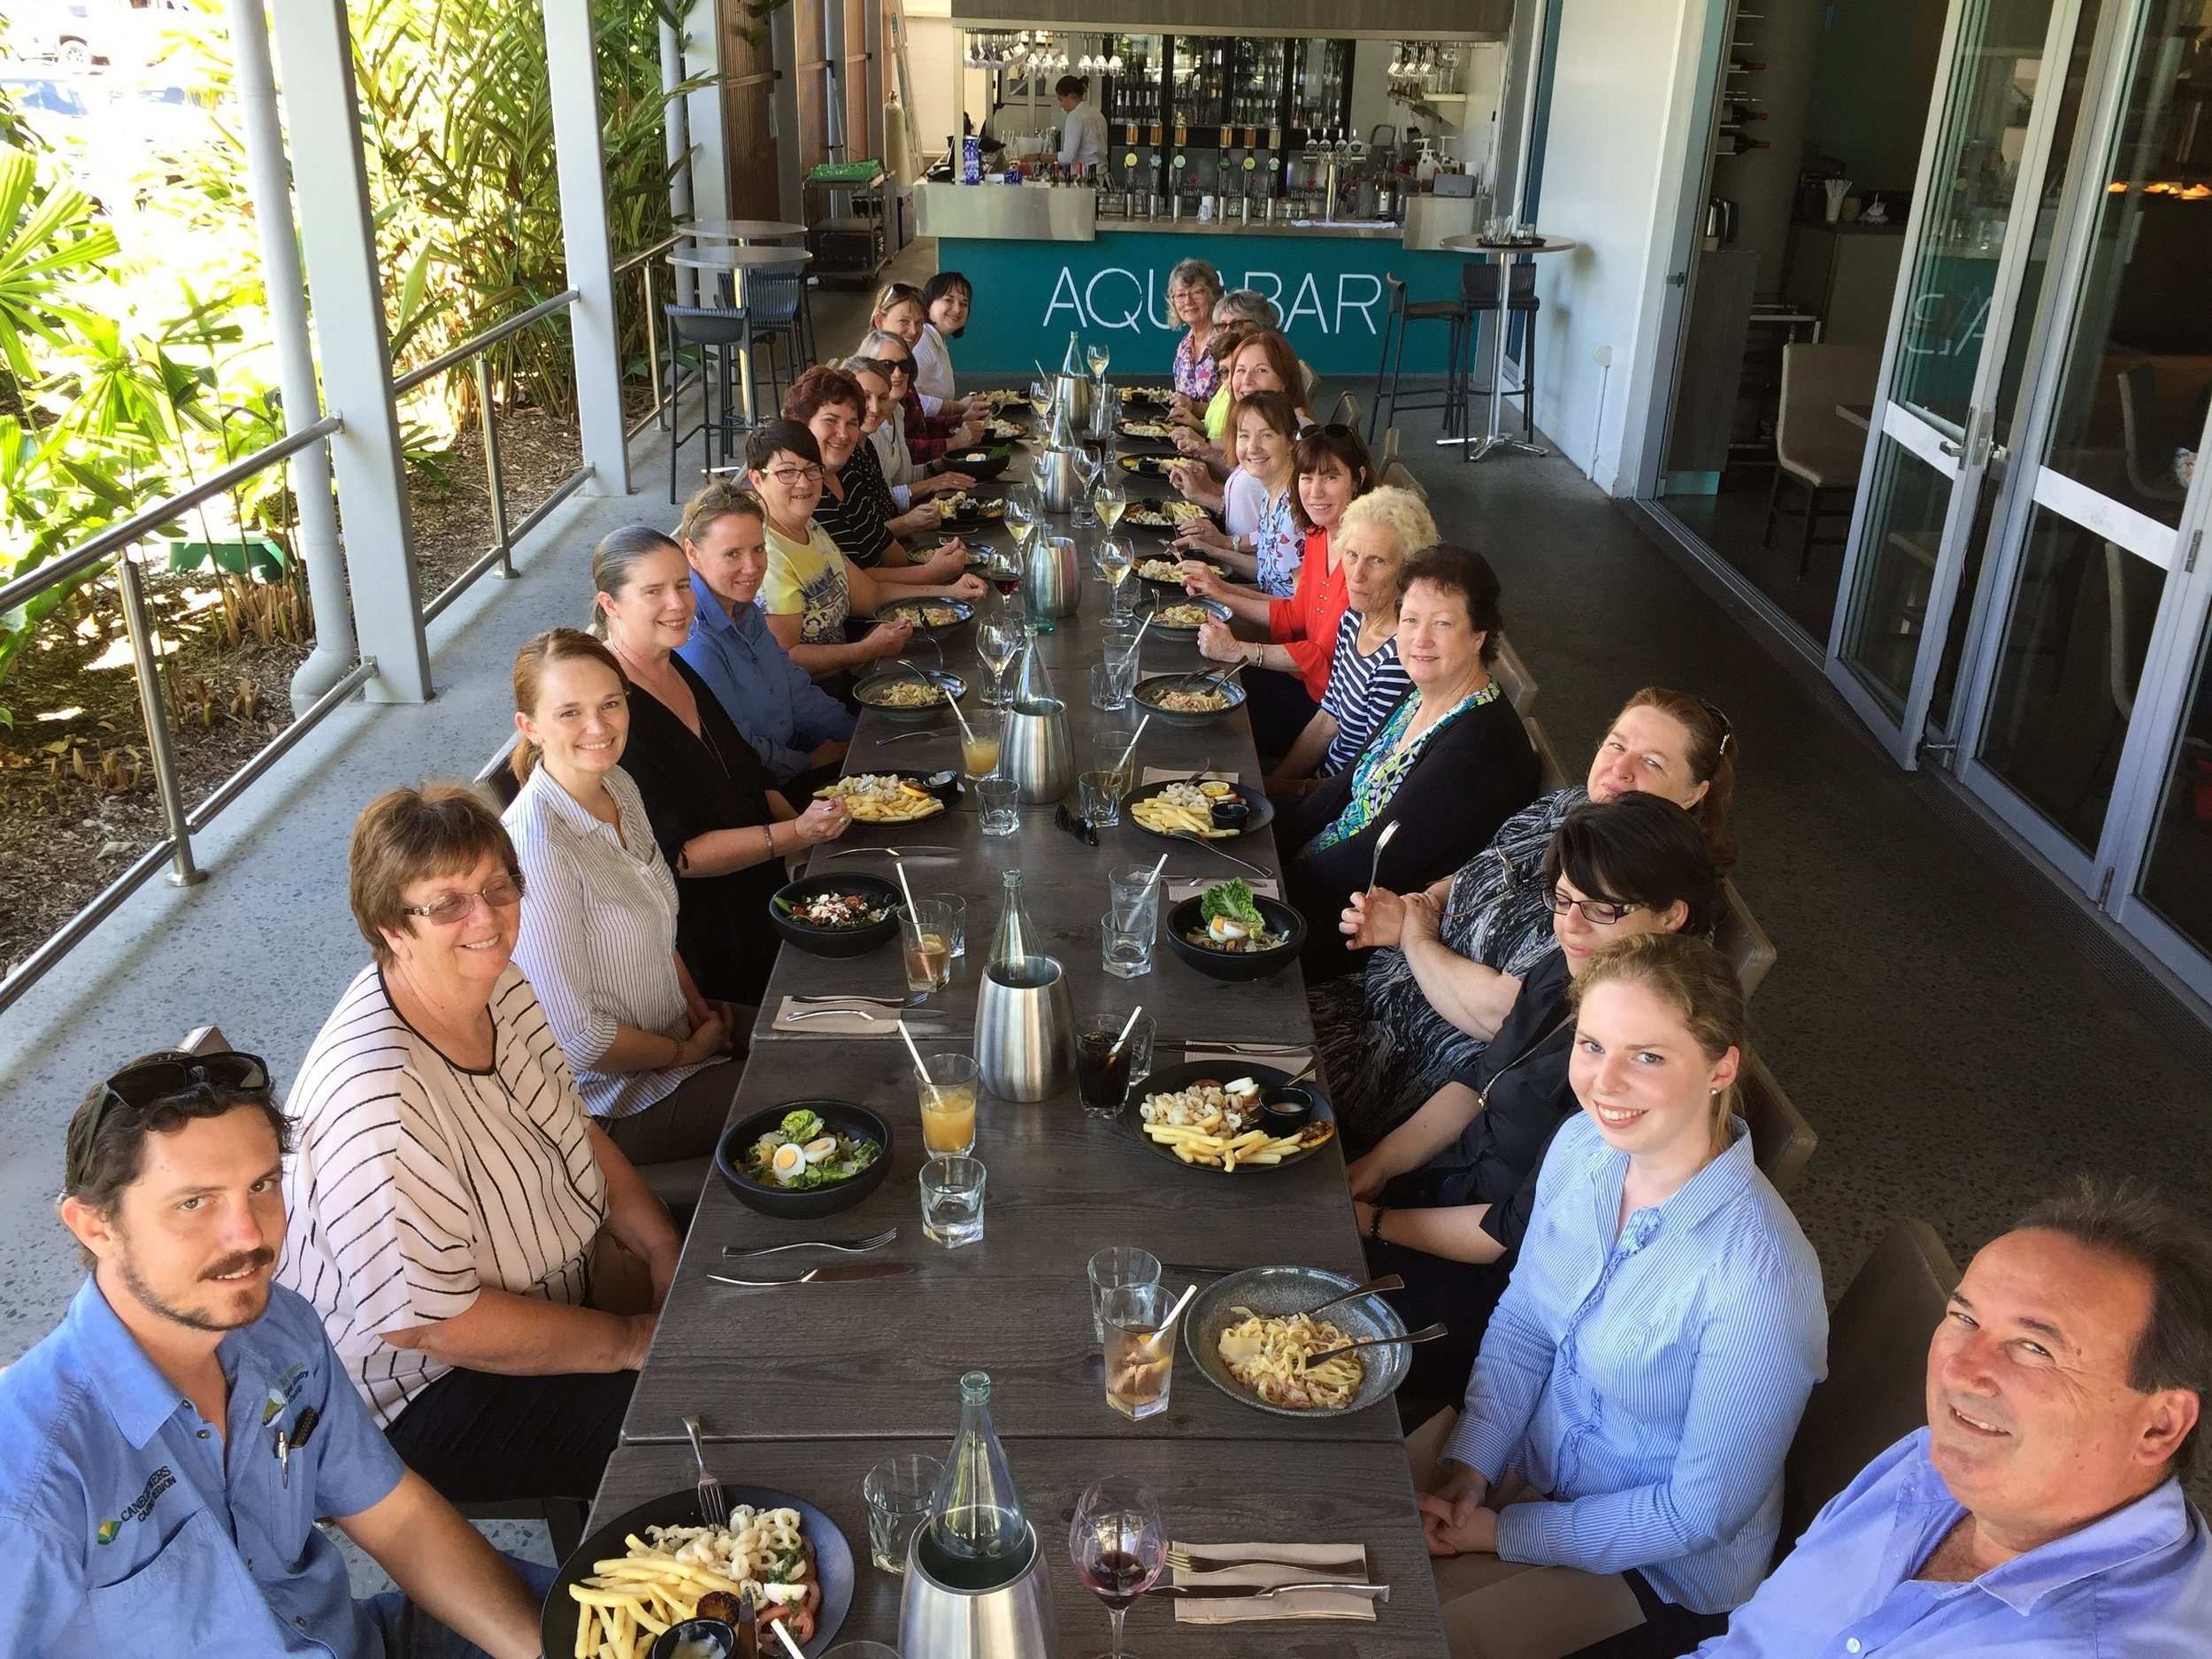 Attendees during lunch at the Cairns Aquarium's Aqualuna Restaurant